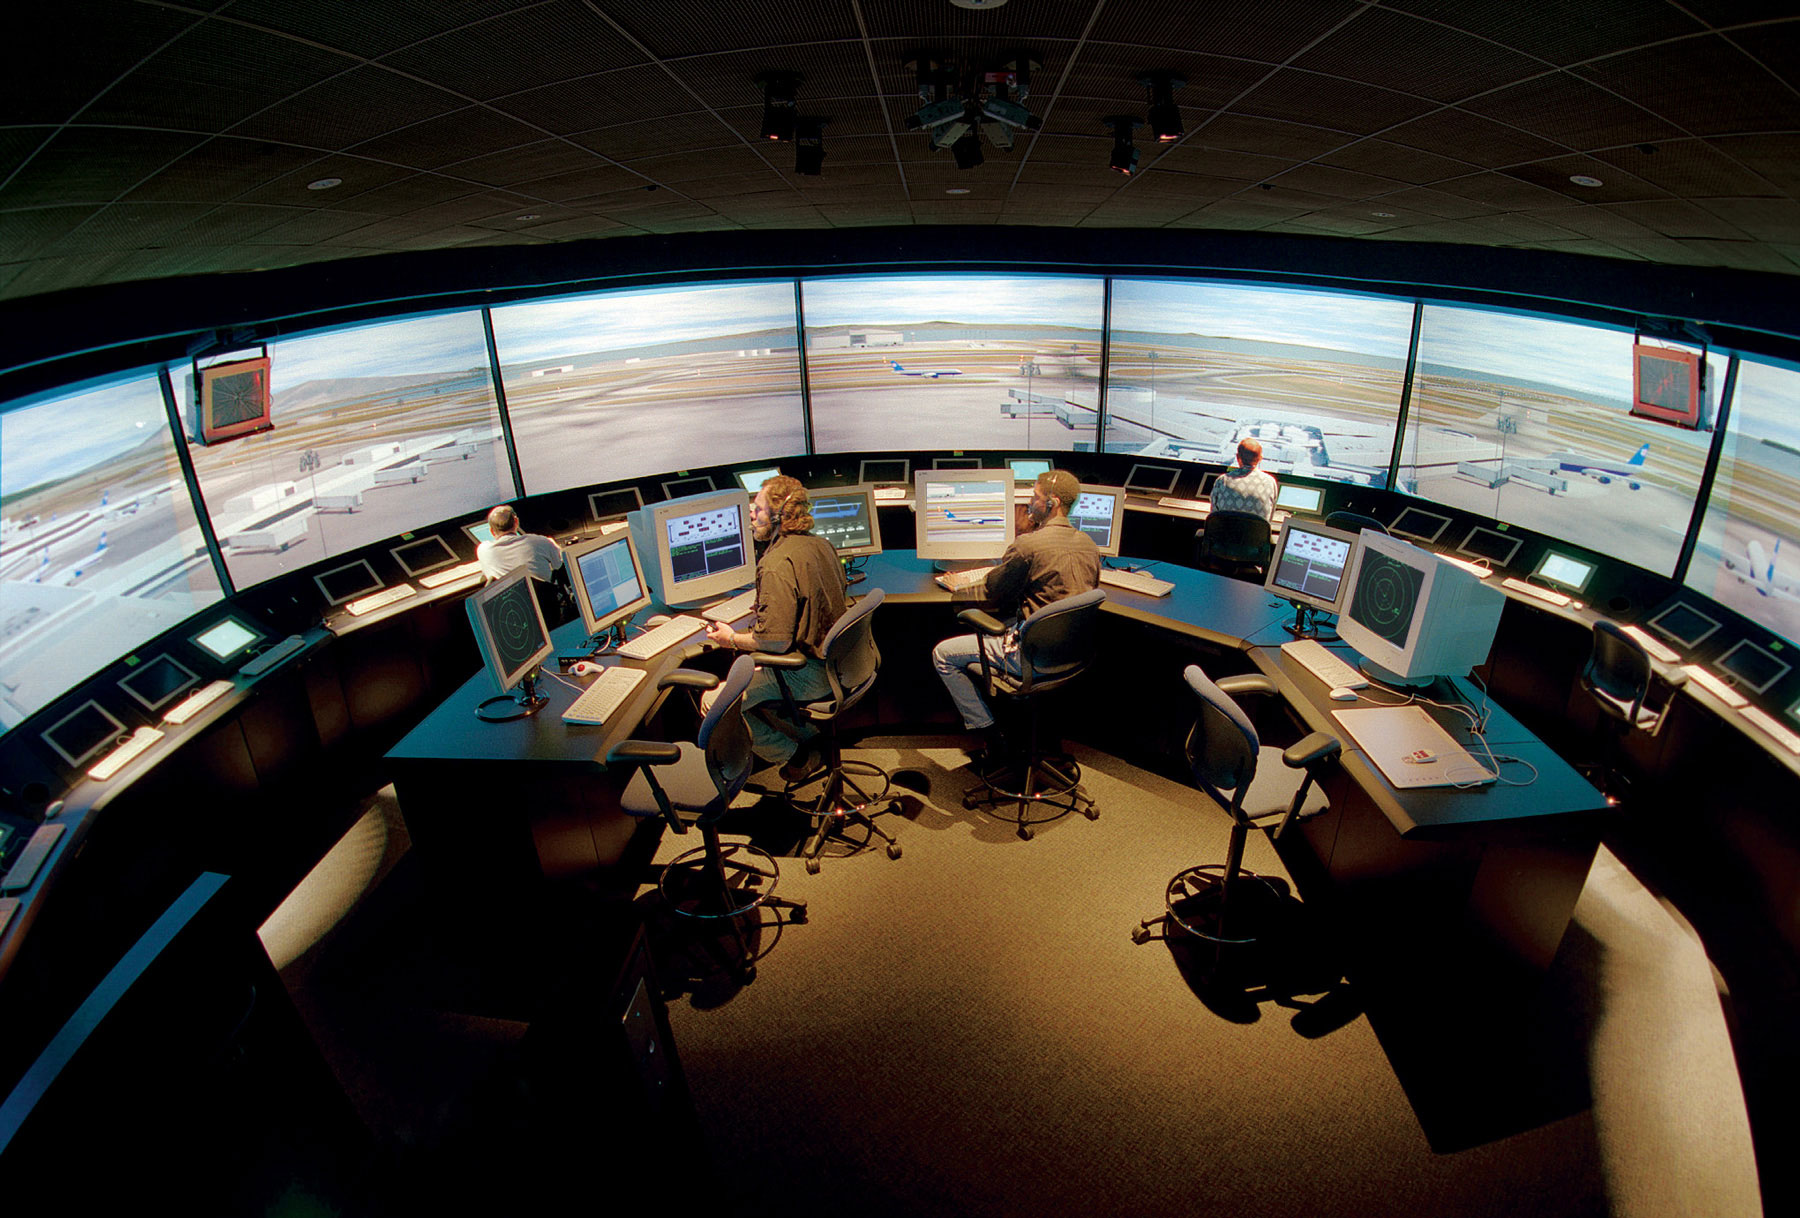 MaxSim ATC Simulation and training